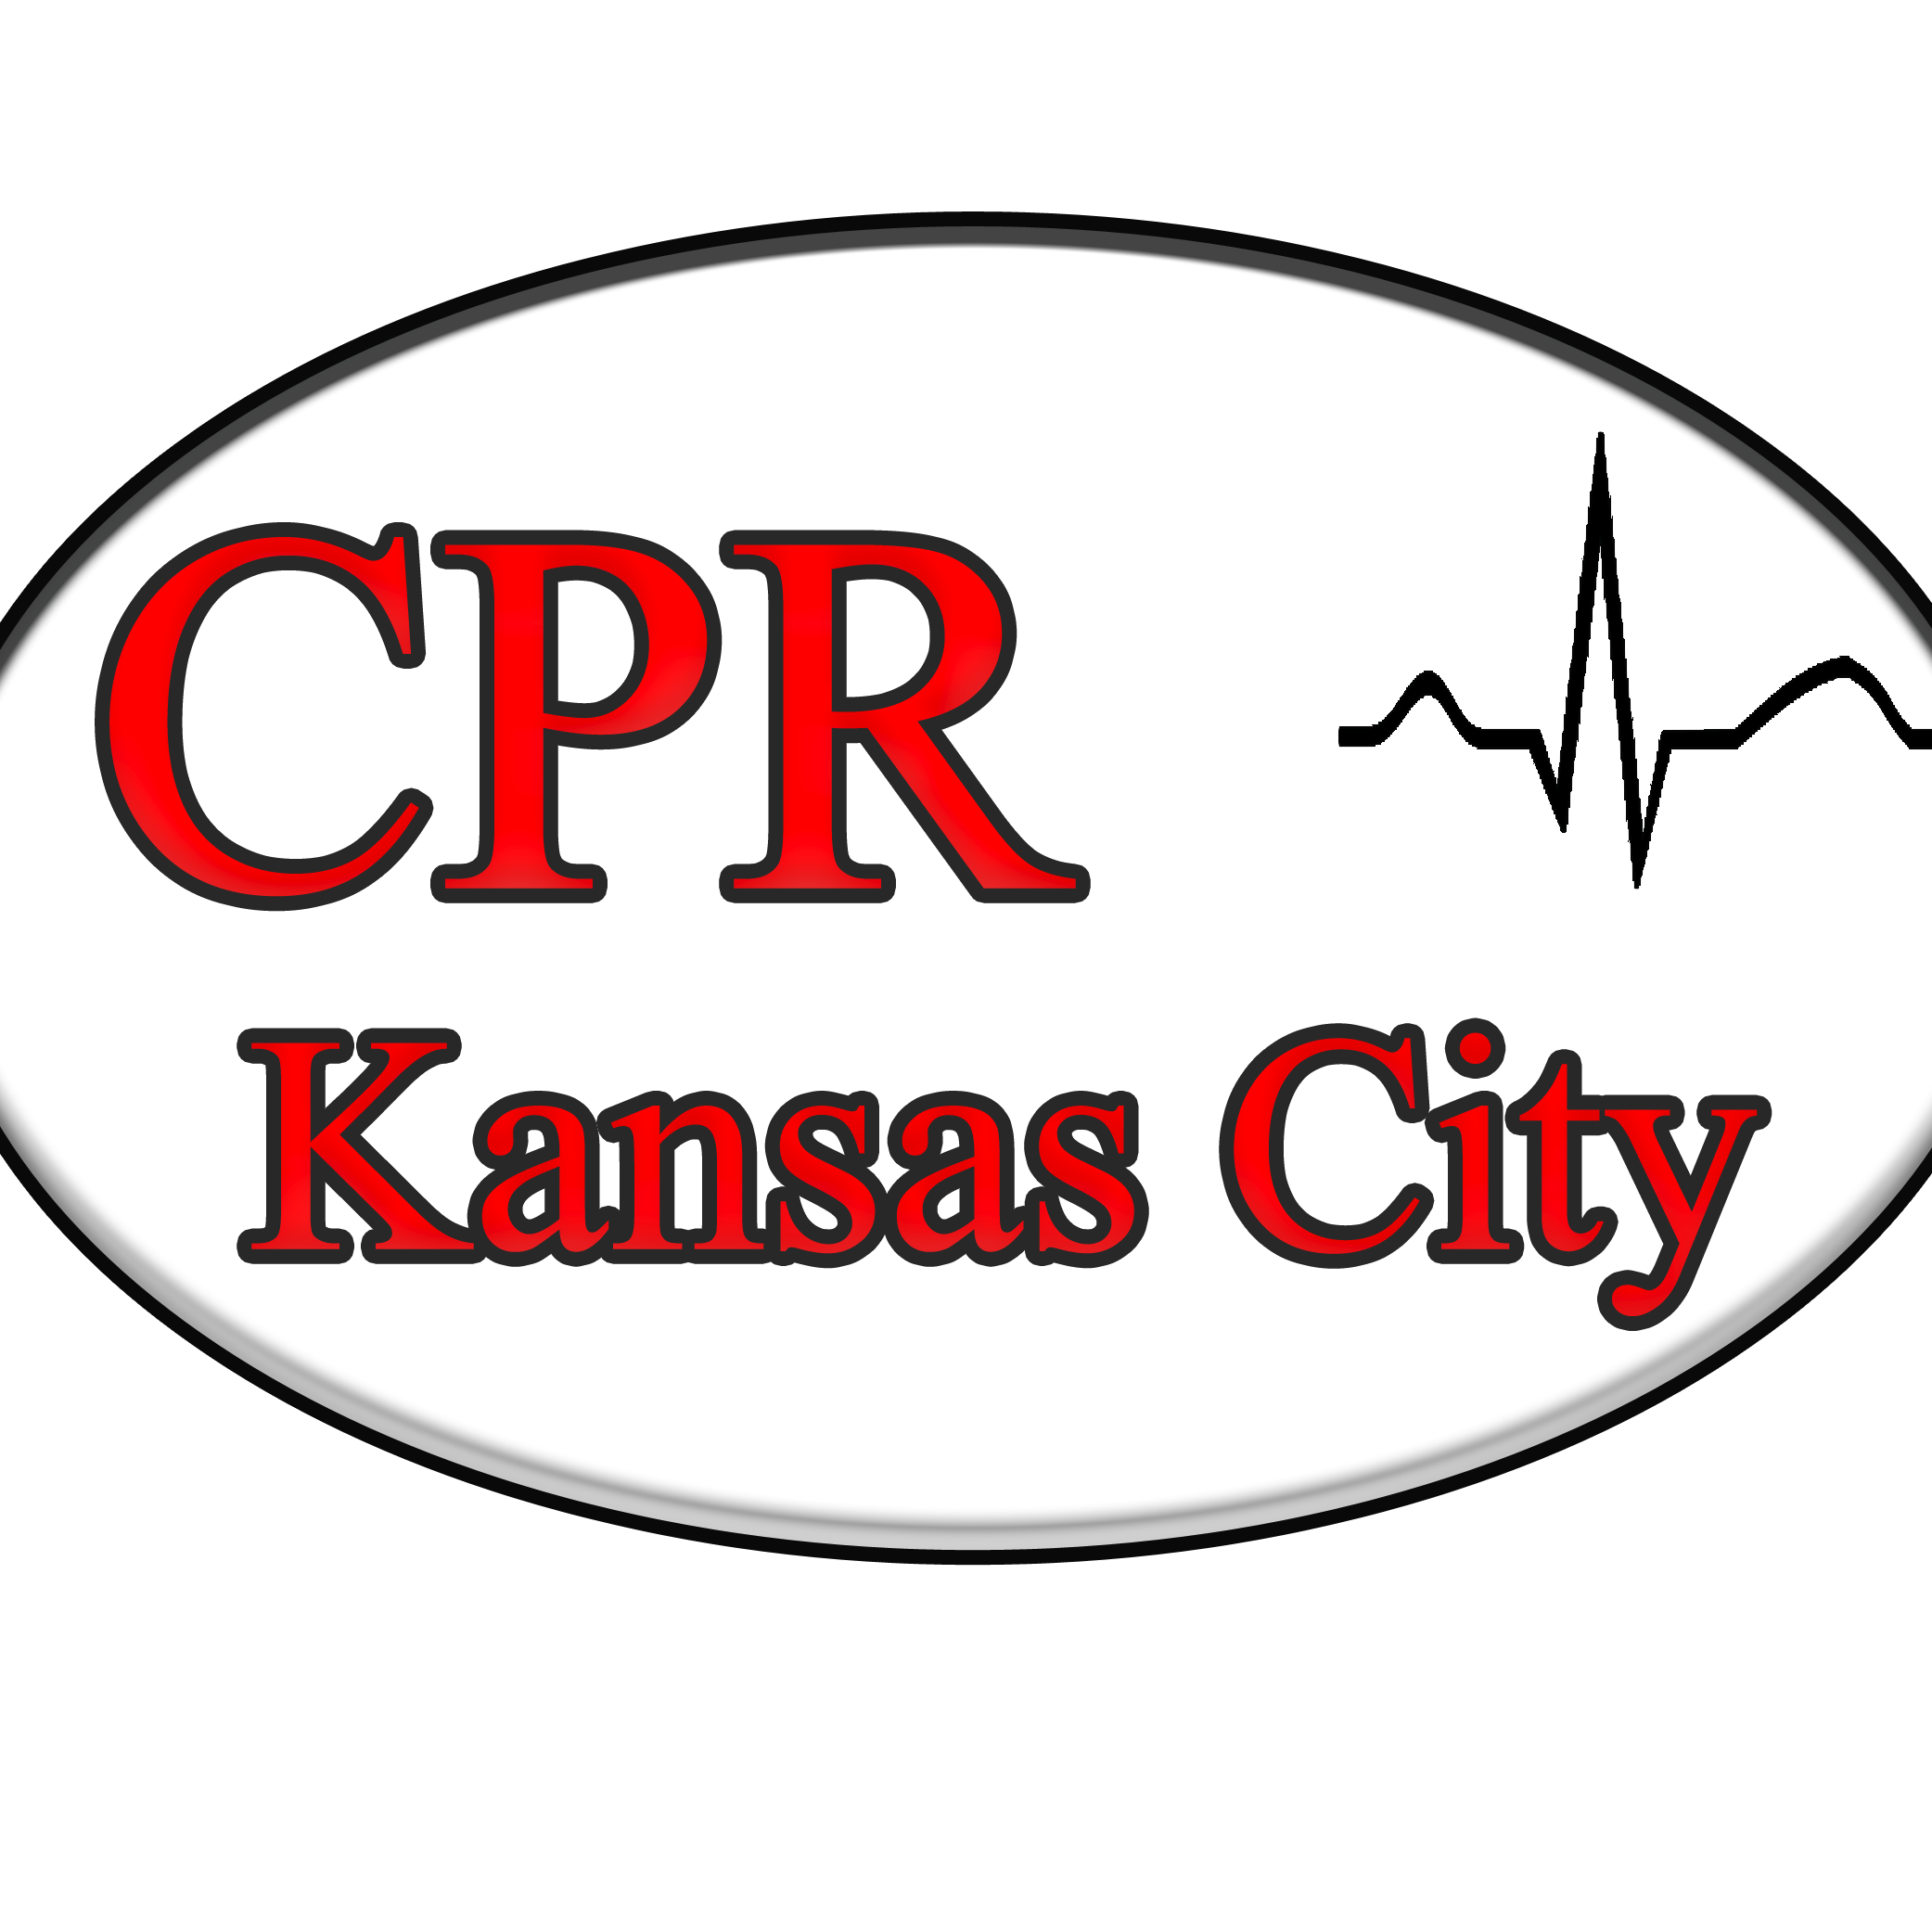 Cpr Classes Kansas City Ks